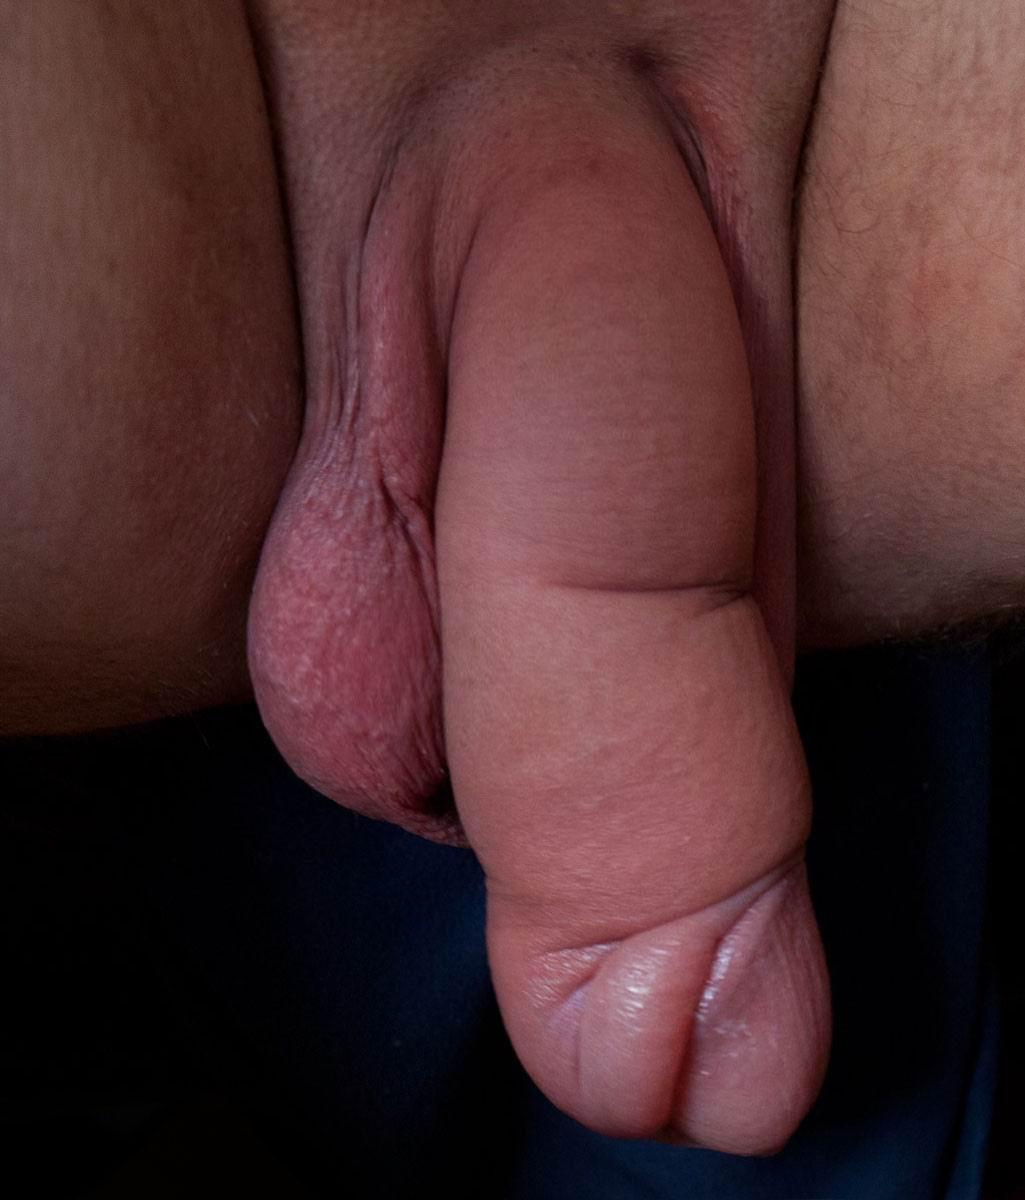 amatuer chinese women having sex